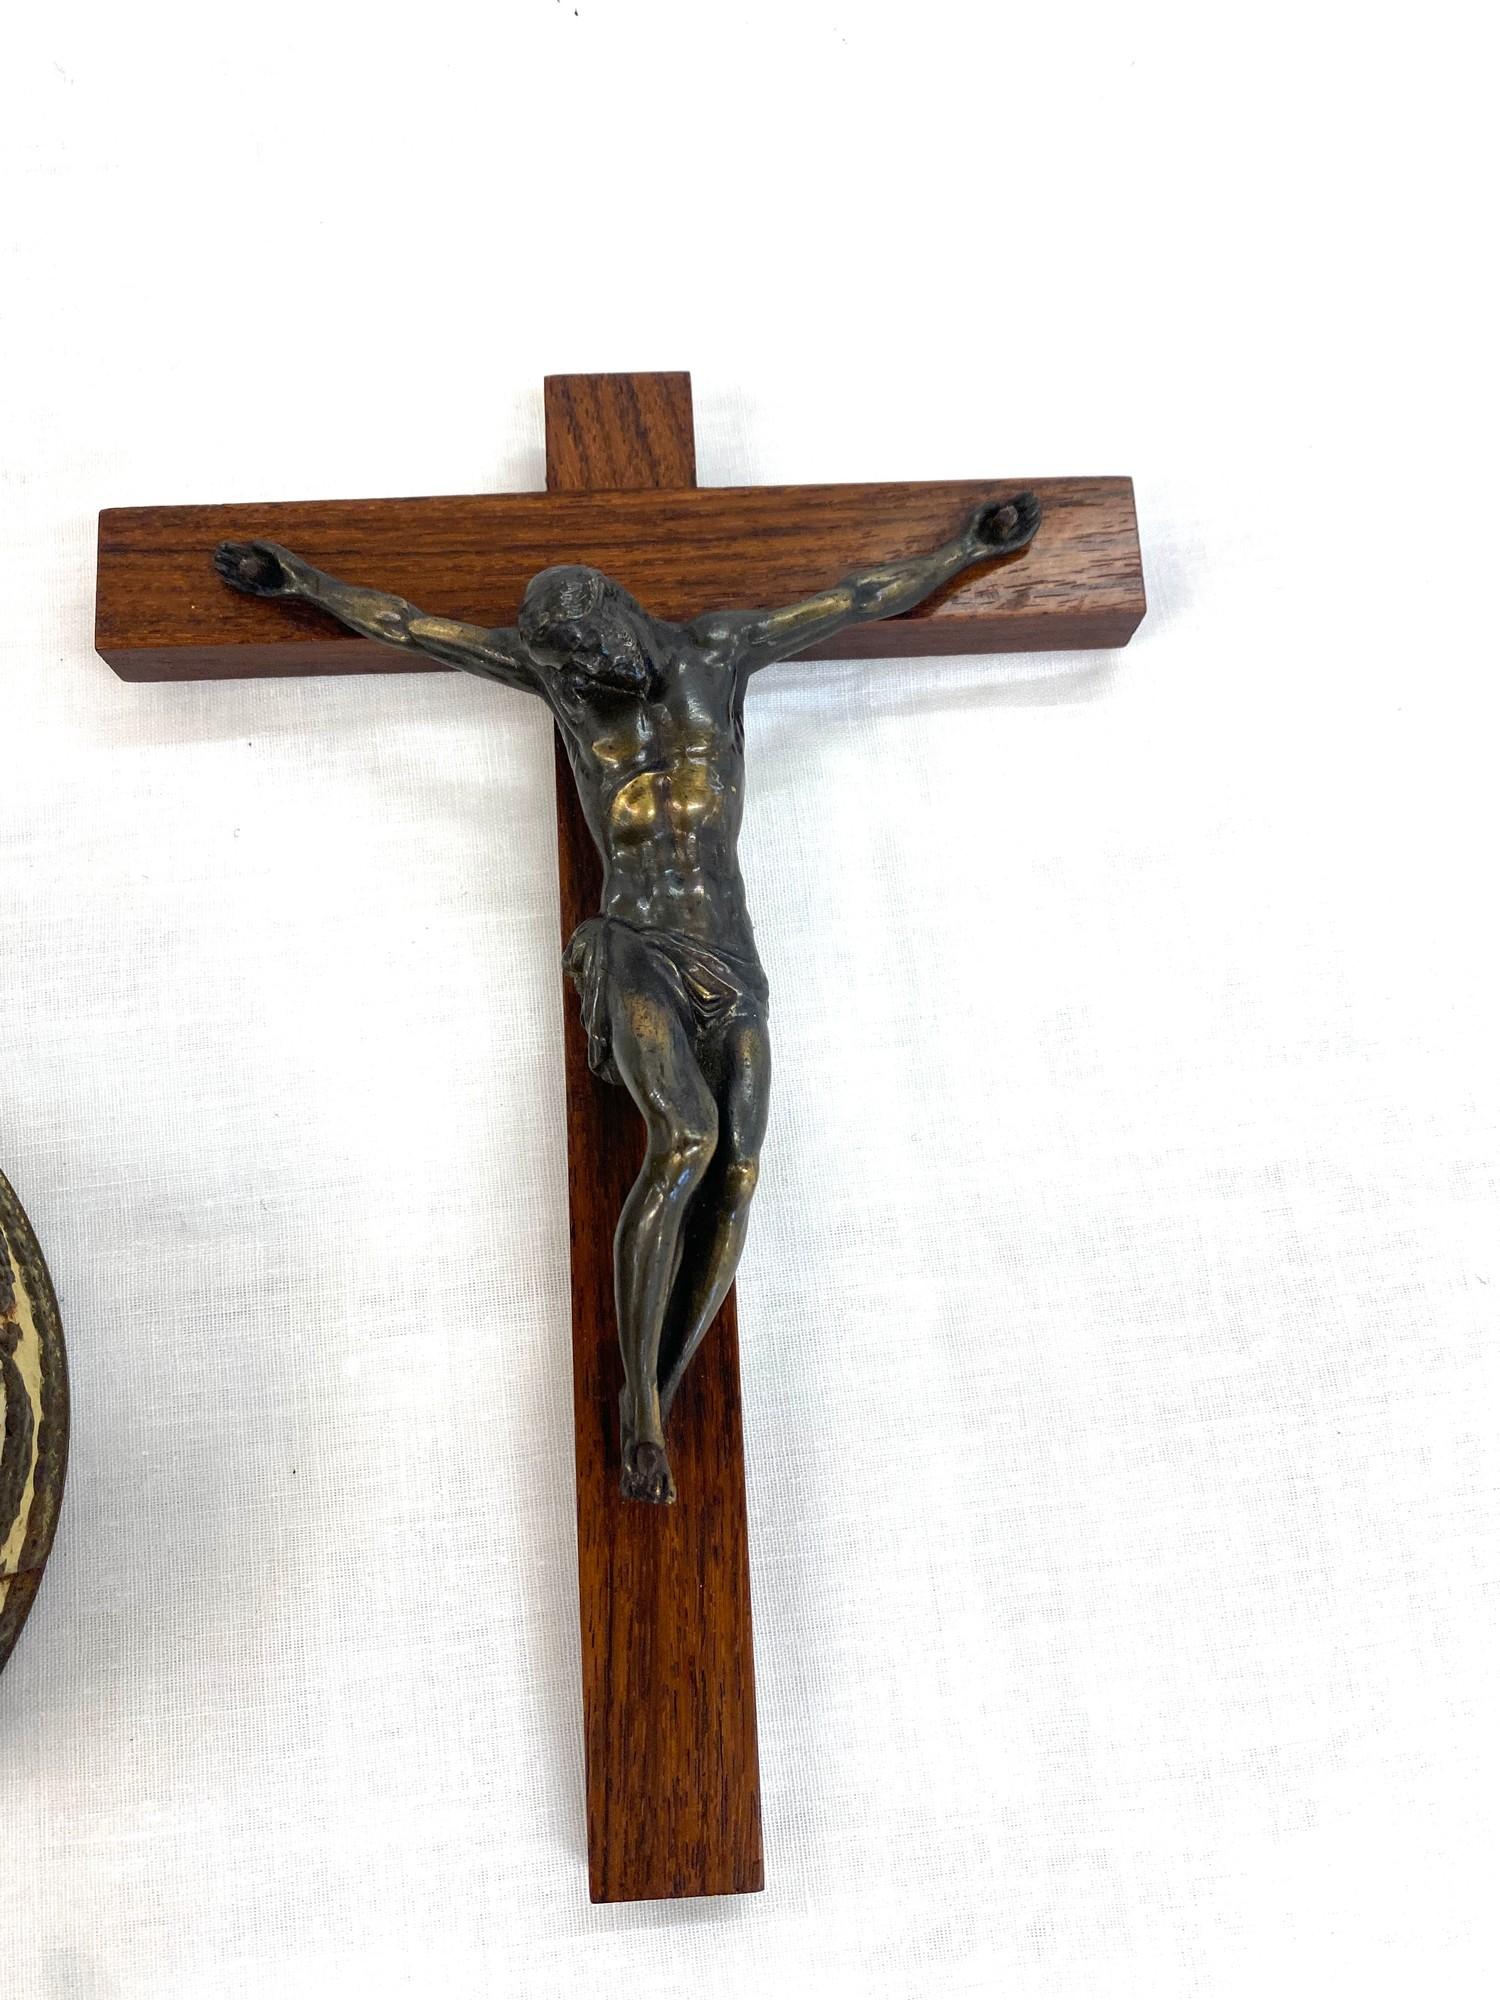 Onyx Cigarette box, large crucifix and a commemorative tin - Image 2 of 4